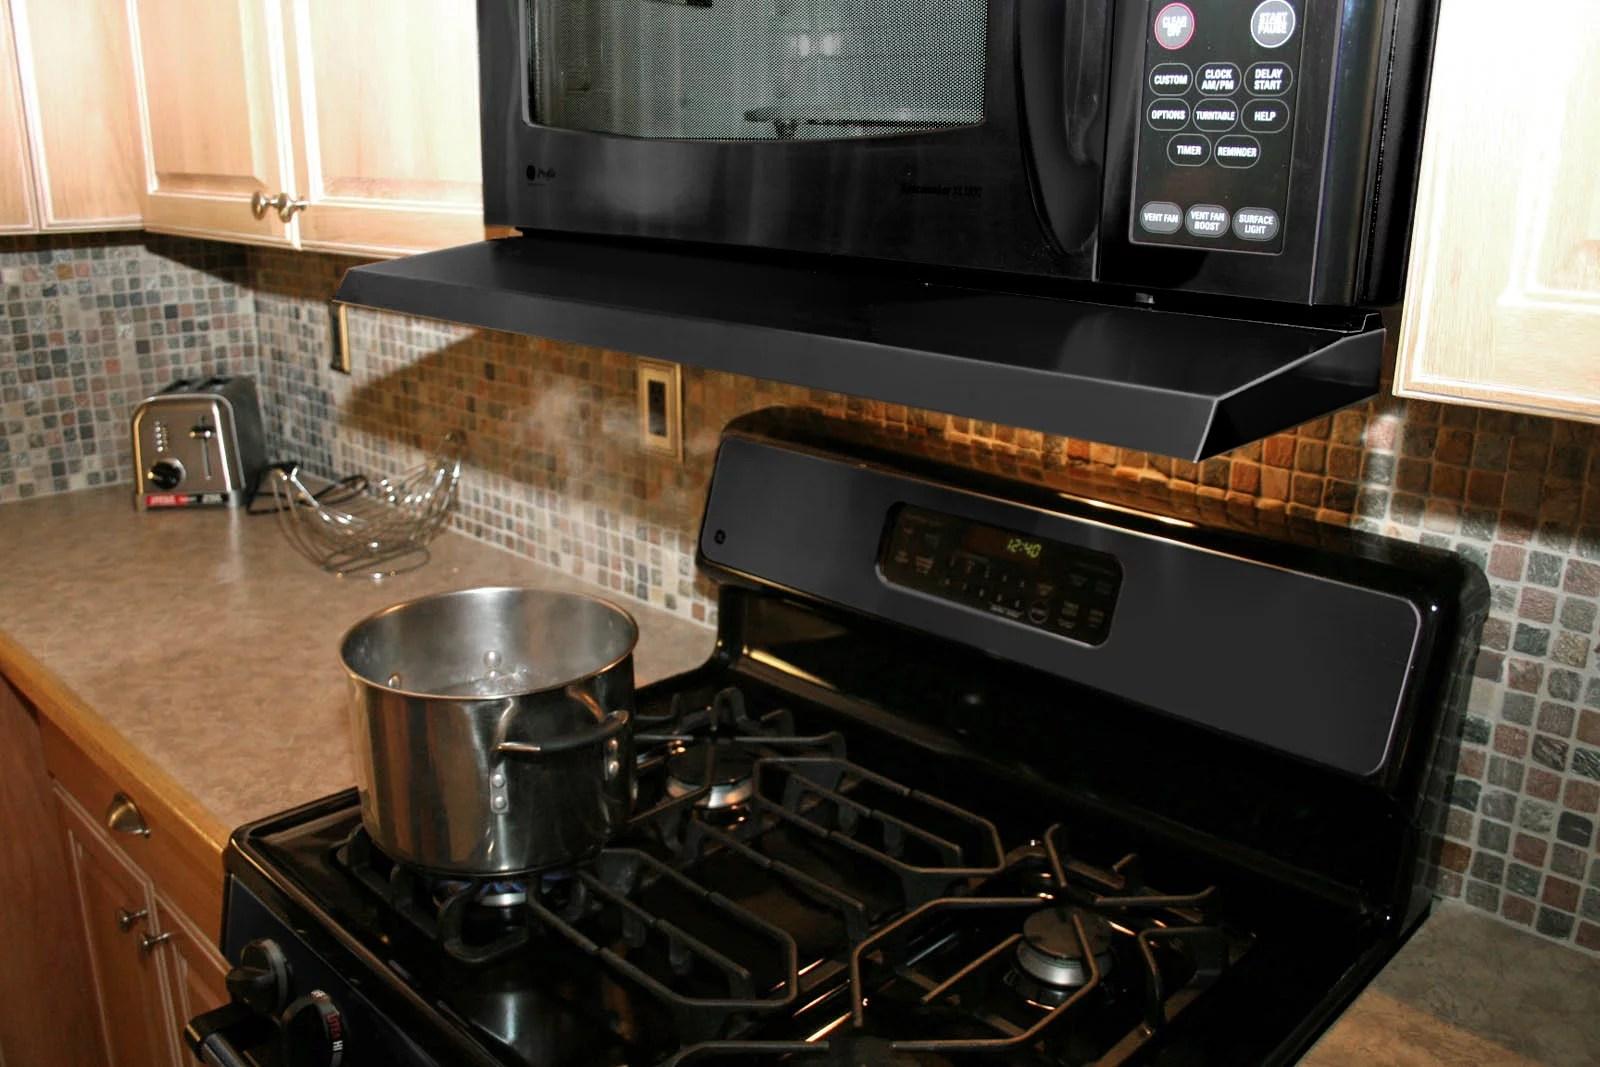 microvisor removable mini hood extension for microwave over the range black